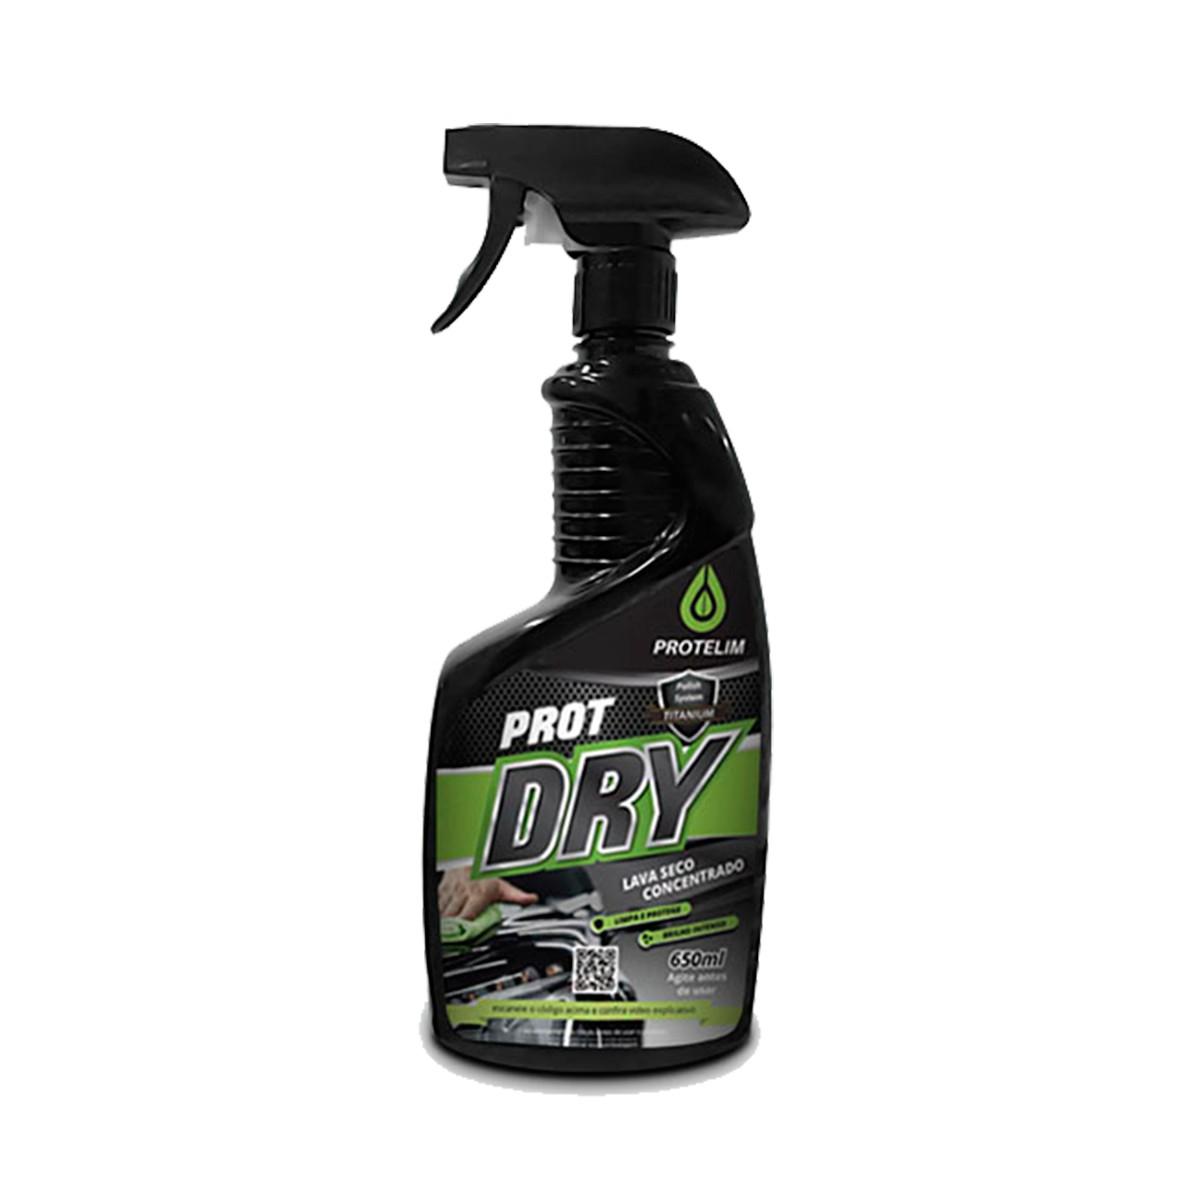 Prot Dry 650ml (Pronto para Uso) - Protelim